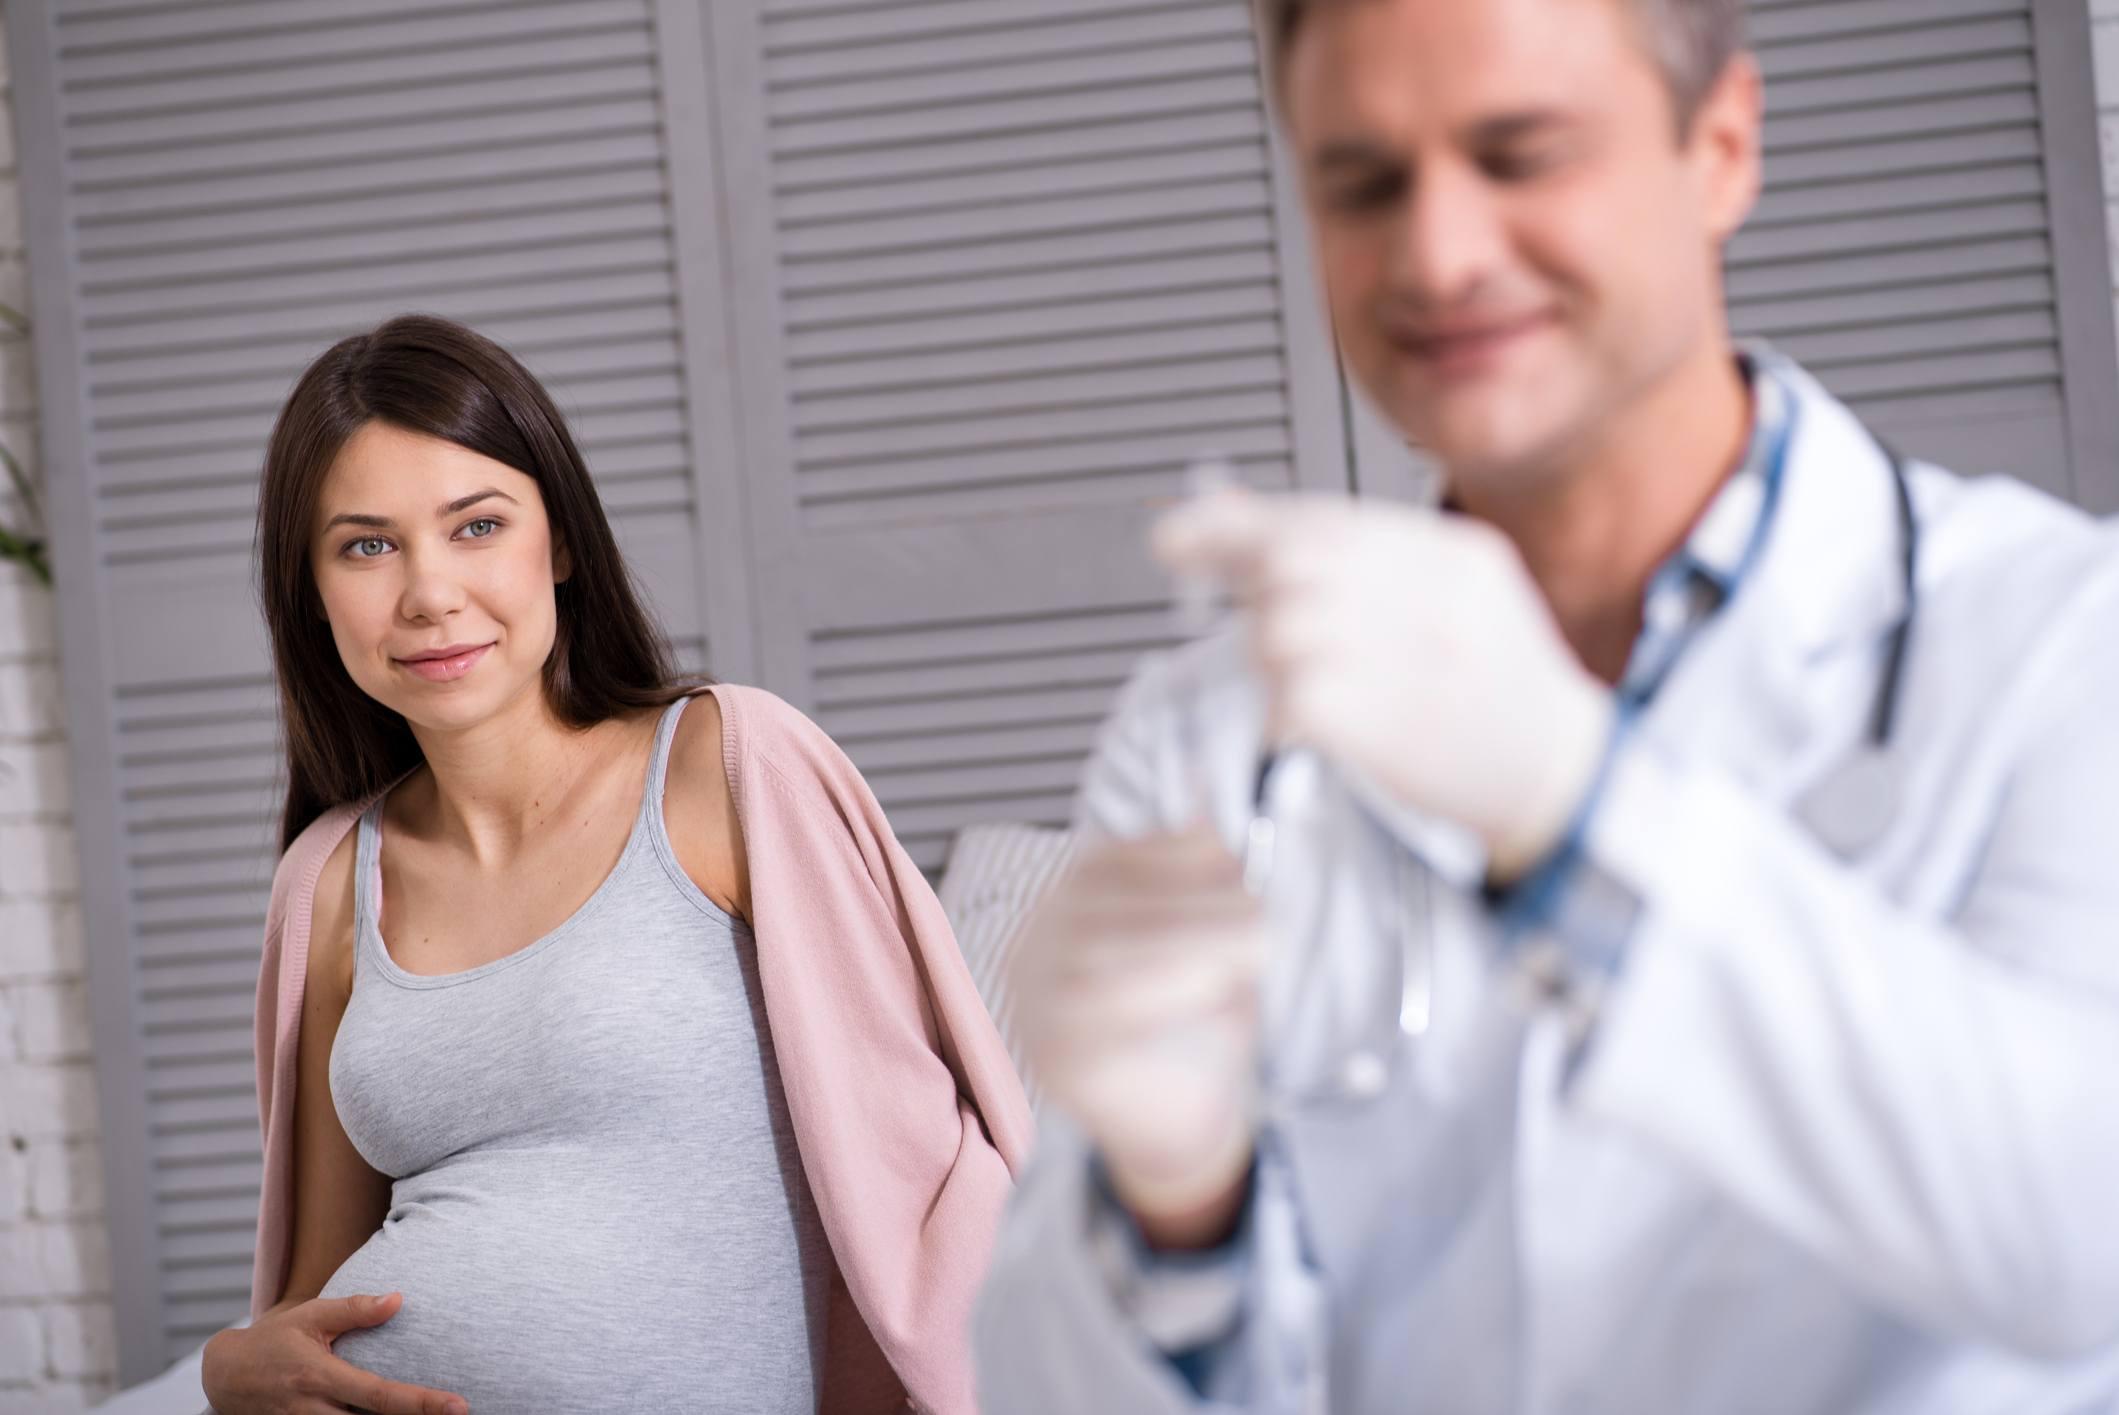 Pregnant getting vaccine